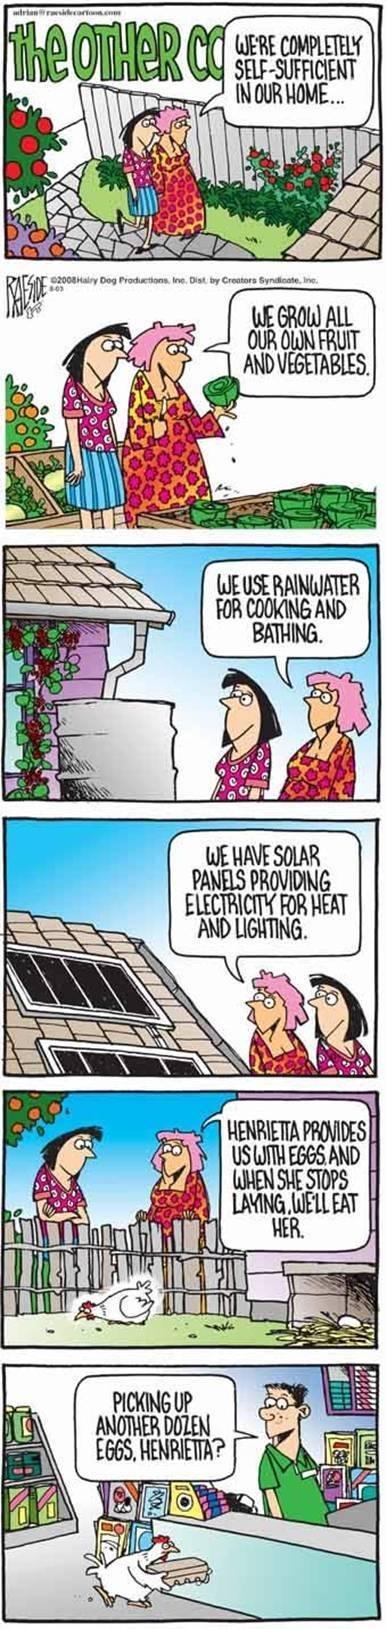 Henrieta. Source in the comic. PAWS Bil Wif. kinda funny